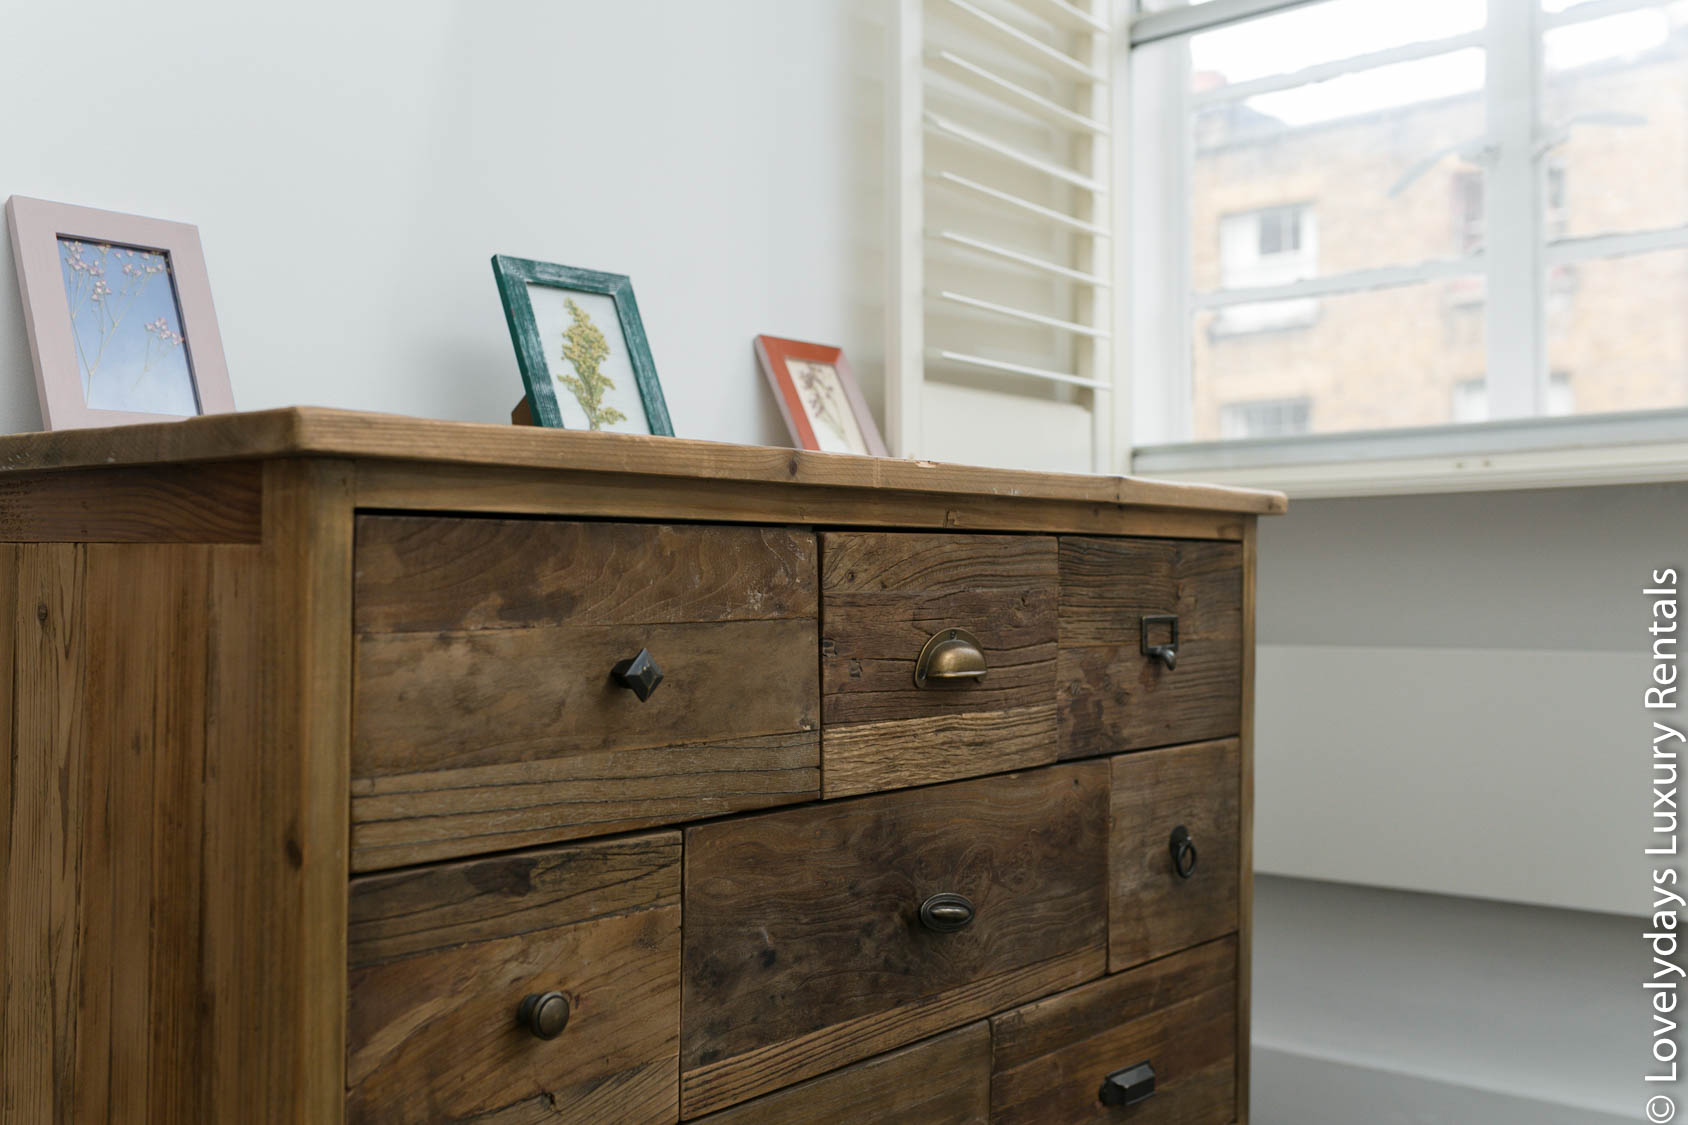 Lovelydays luxury service apartment rental - London - Fitzrovia - Goodge 55 - Lovelysuite - 2 bedrooms - 3 bathrooms - Design - f12a5e110718 - Lovelydays